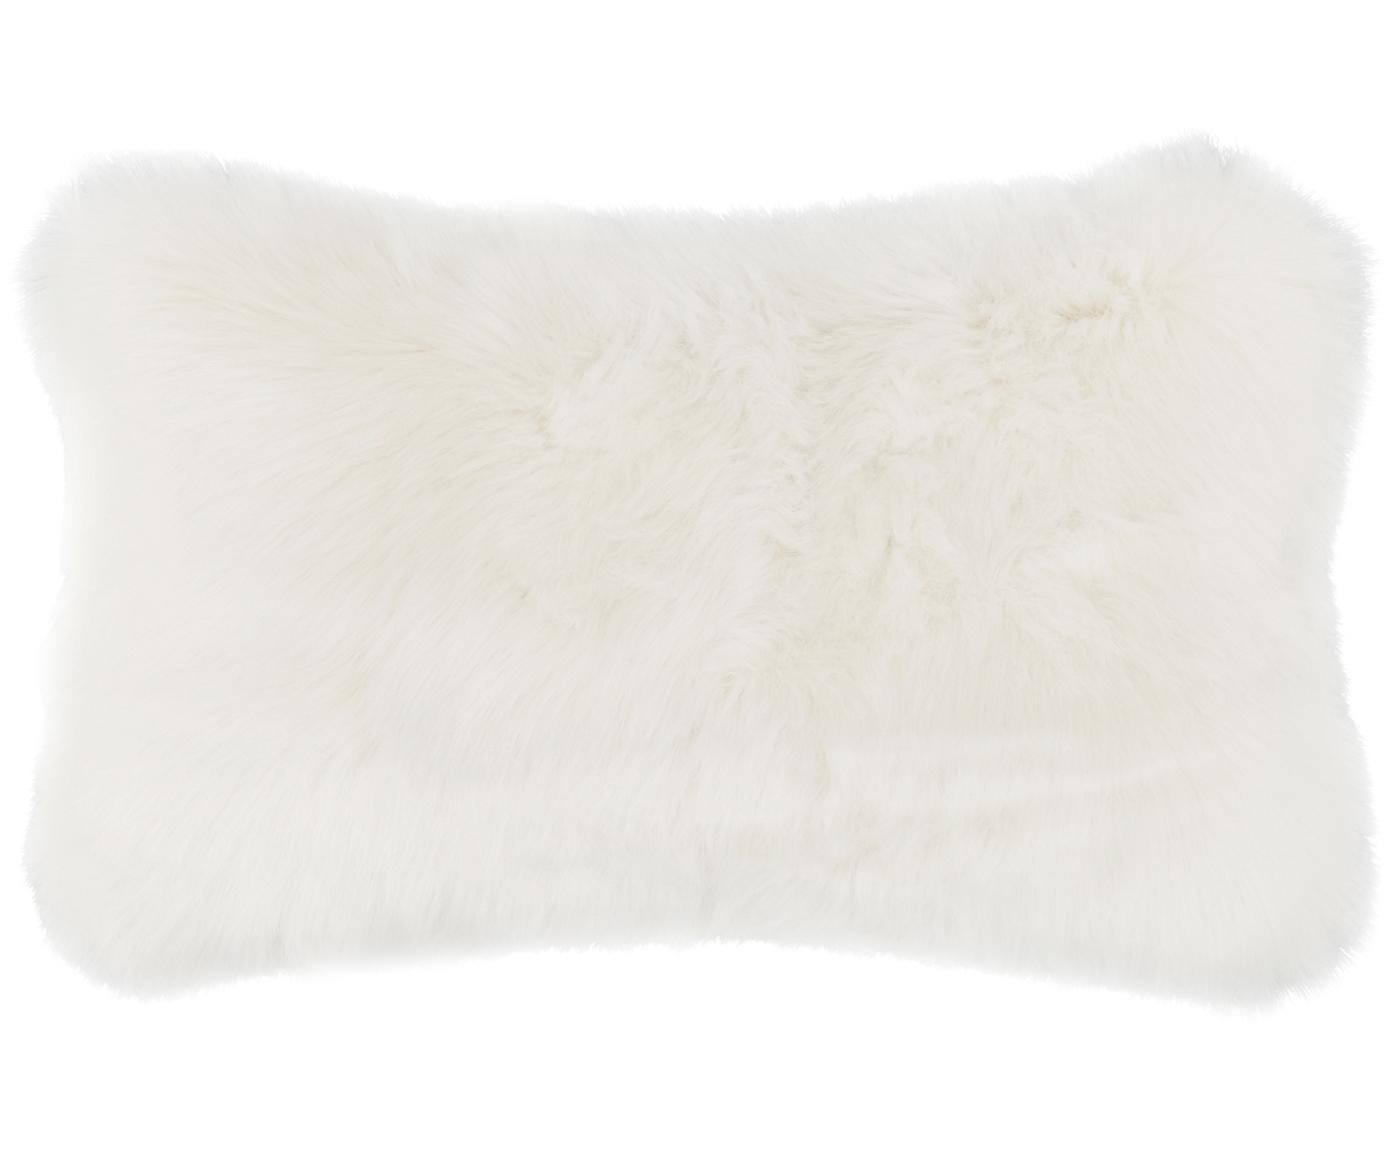 Flauschige Kunstfell-Kissenhülle Mathilde, glatt, Vorderseite: 67% Akryl, 33% Polyester, Rückseite: 100% Polyester, Creme, 30 x 50 cm